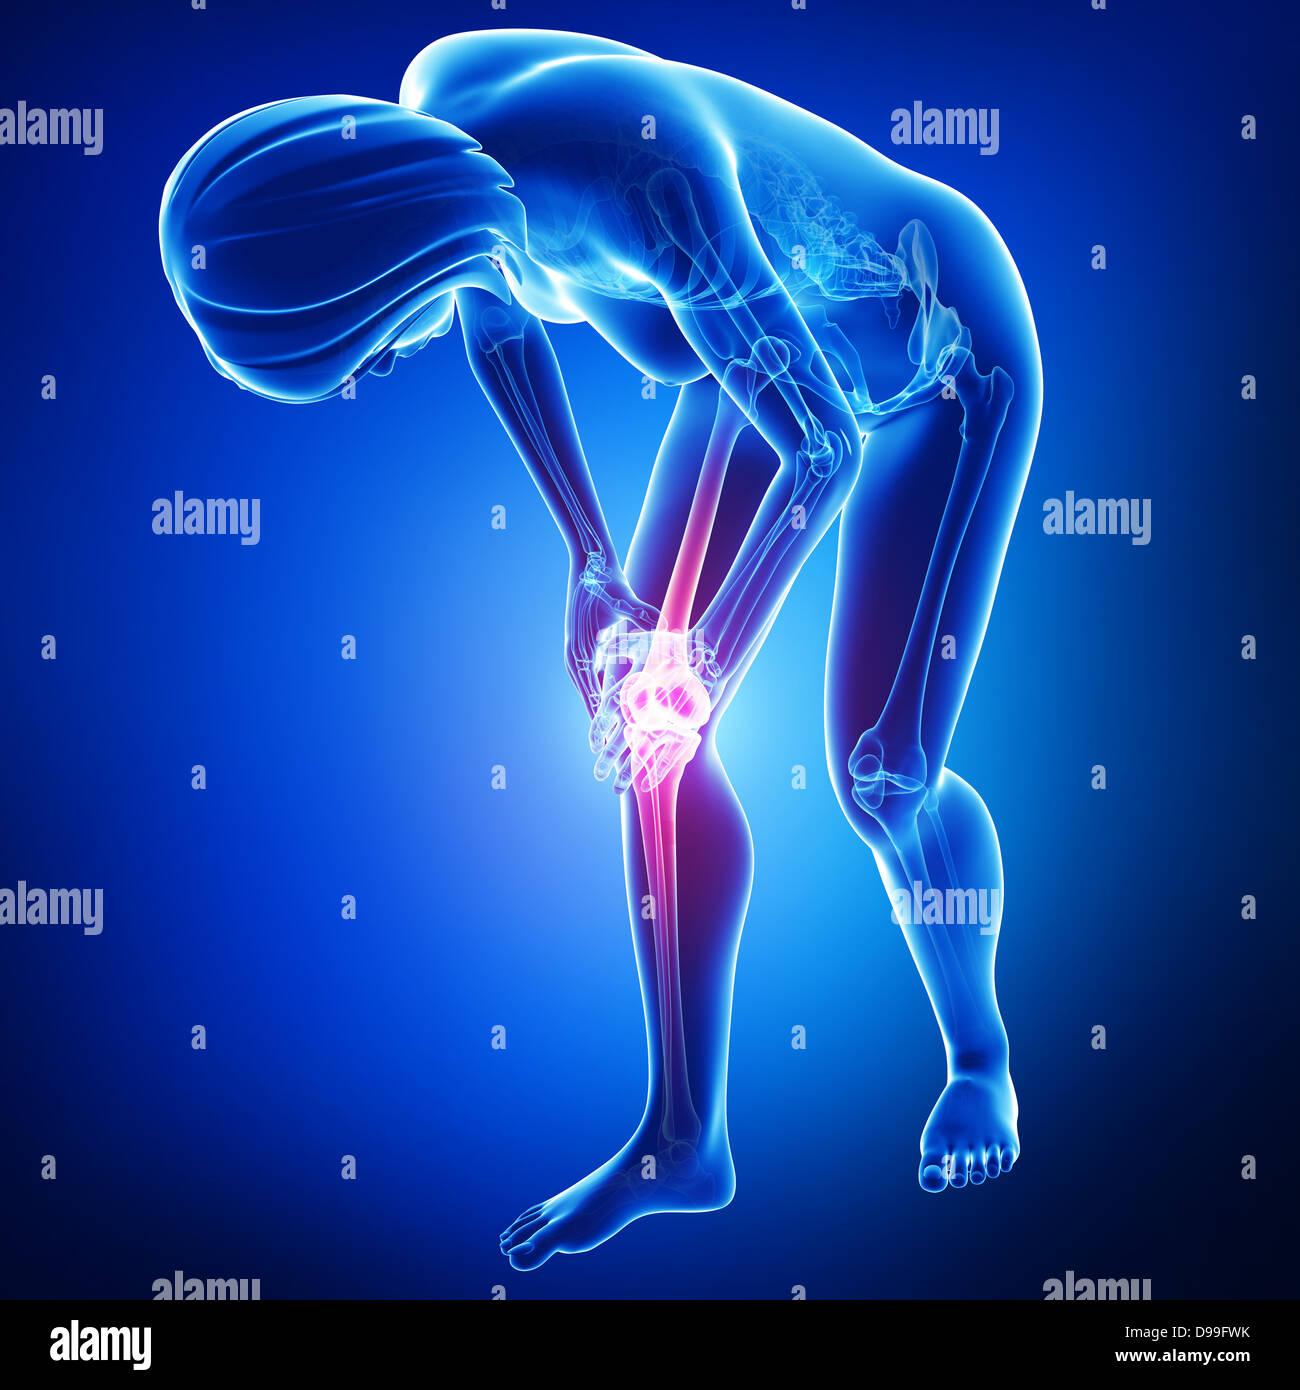 human knee pain anatomy in blue Stock Photo: 57373055 - Alamy